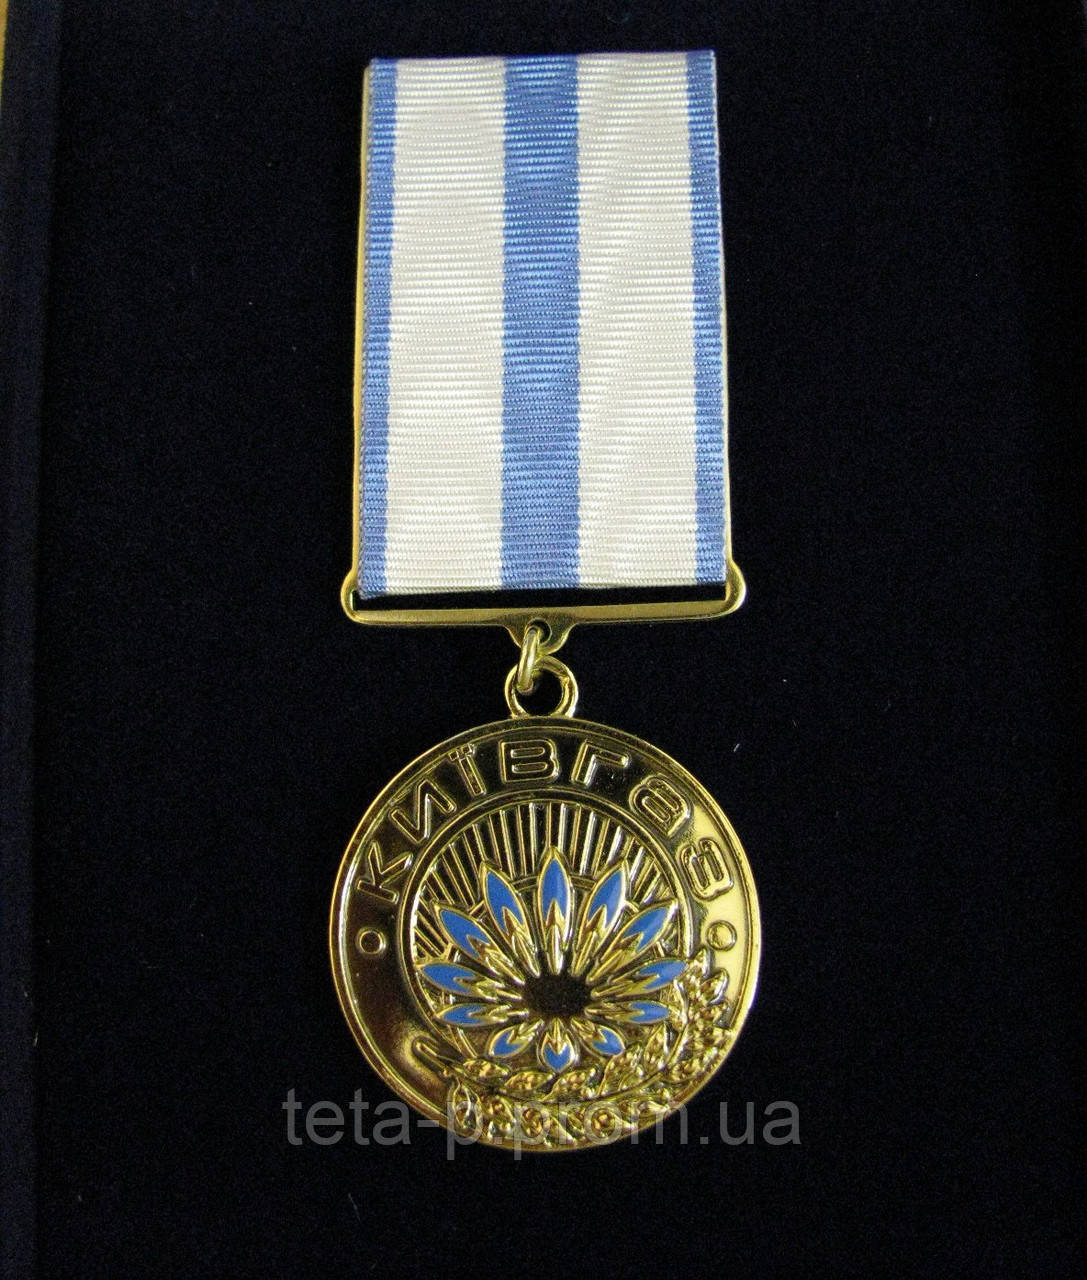 Медали, награды, ордена